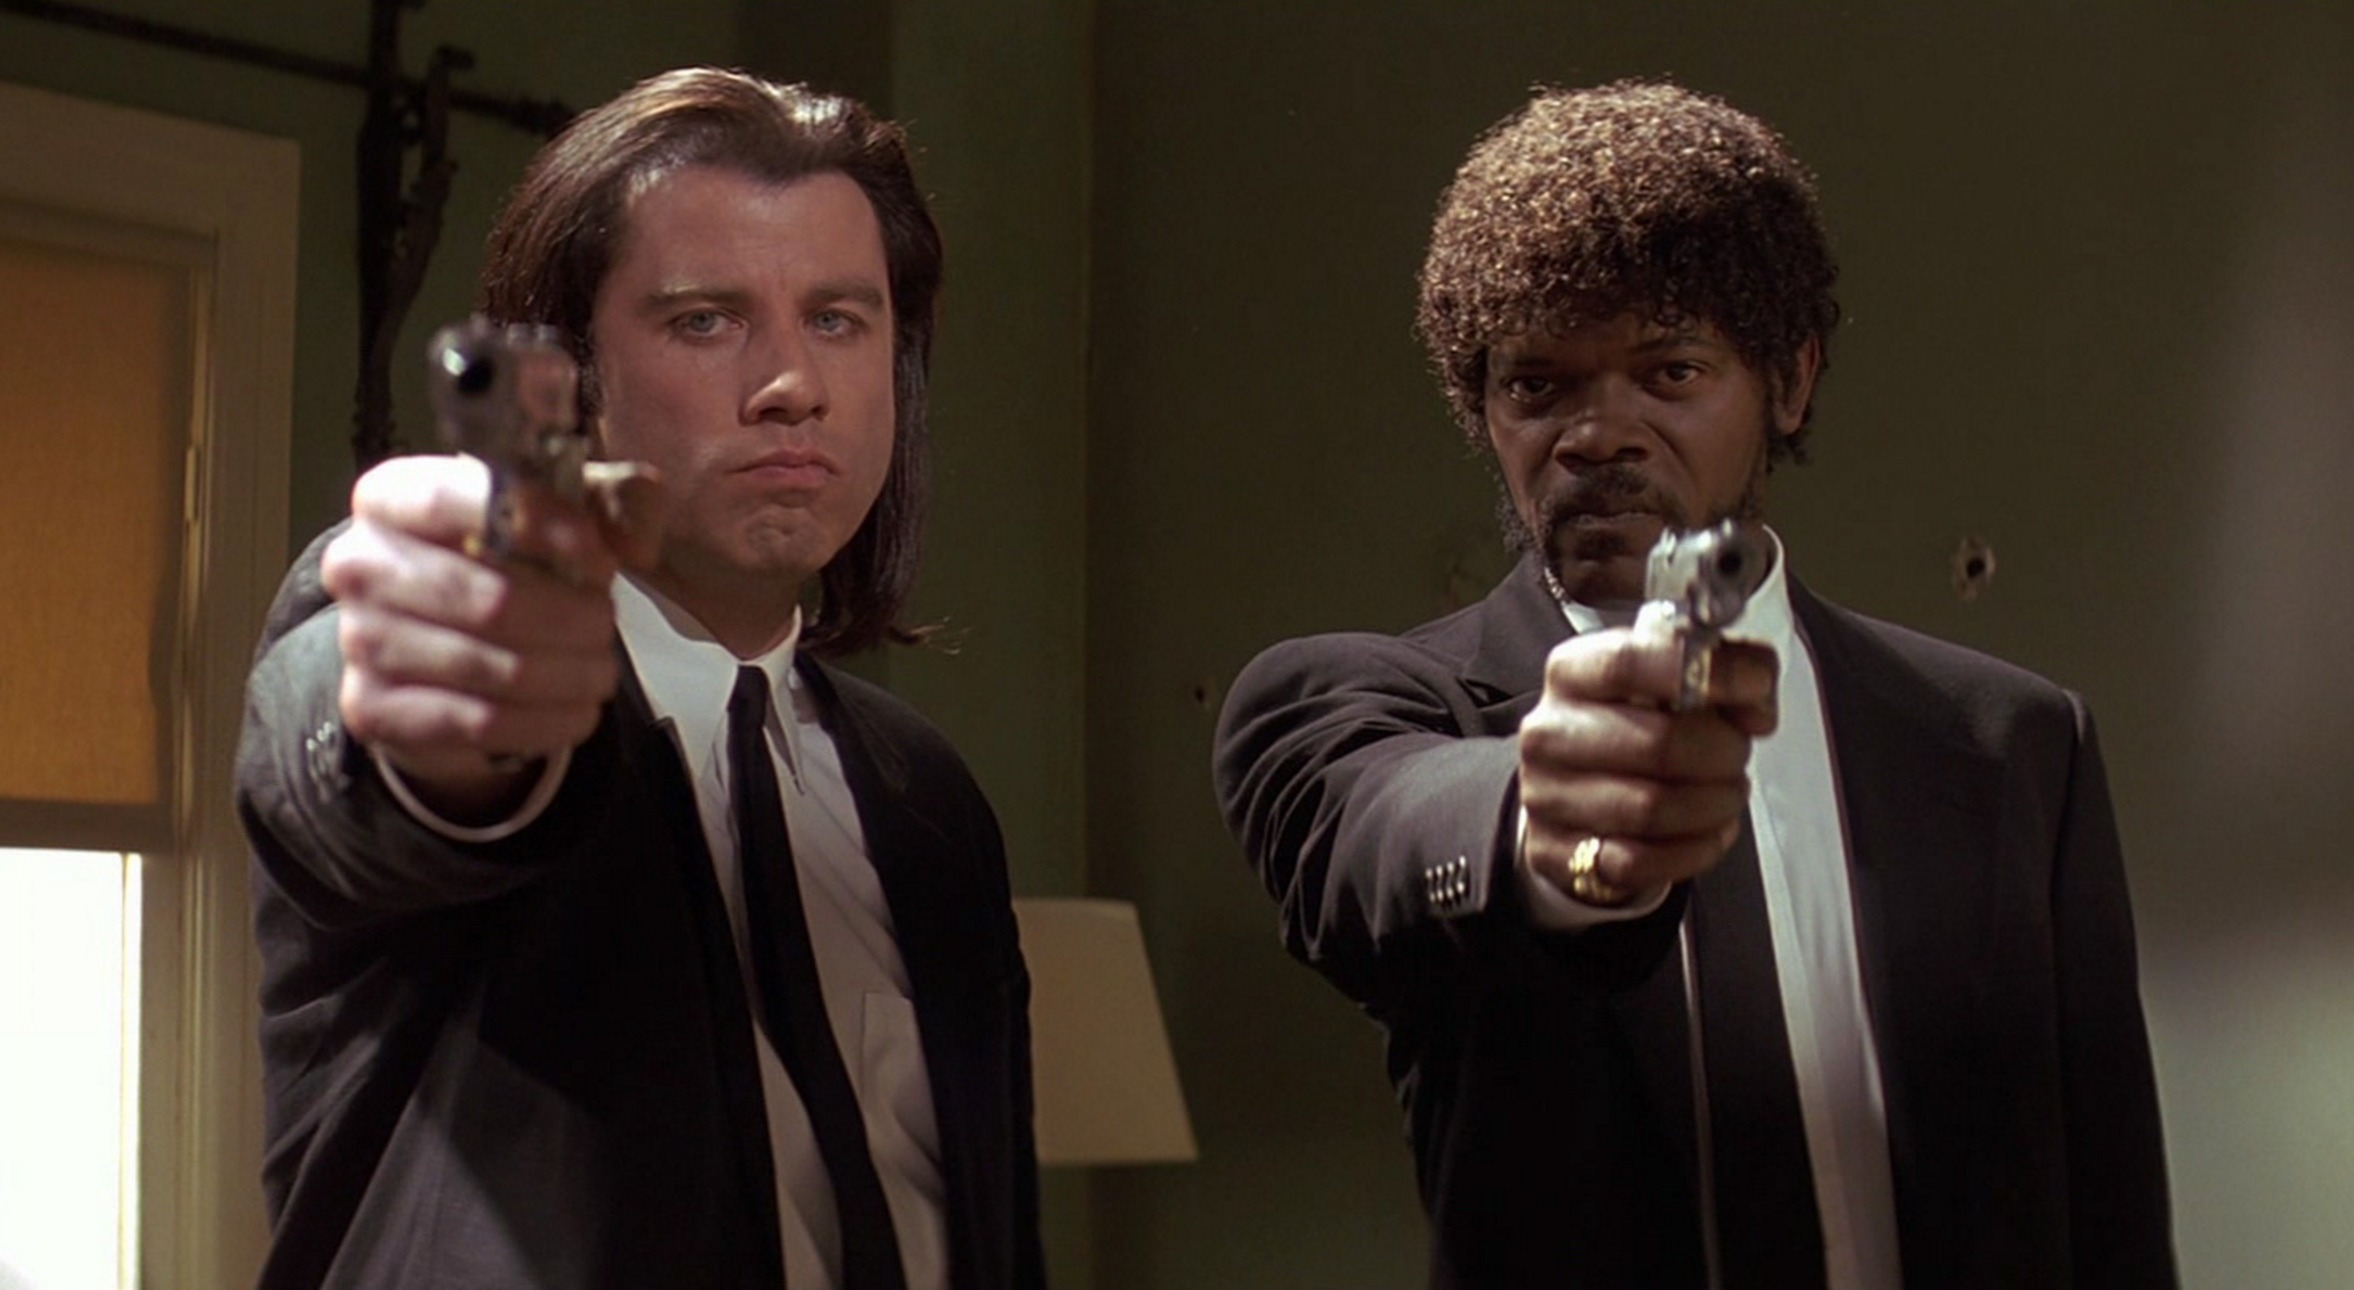 5506 - ¿Cuánto sabes de Pulp Fiction?